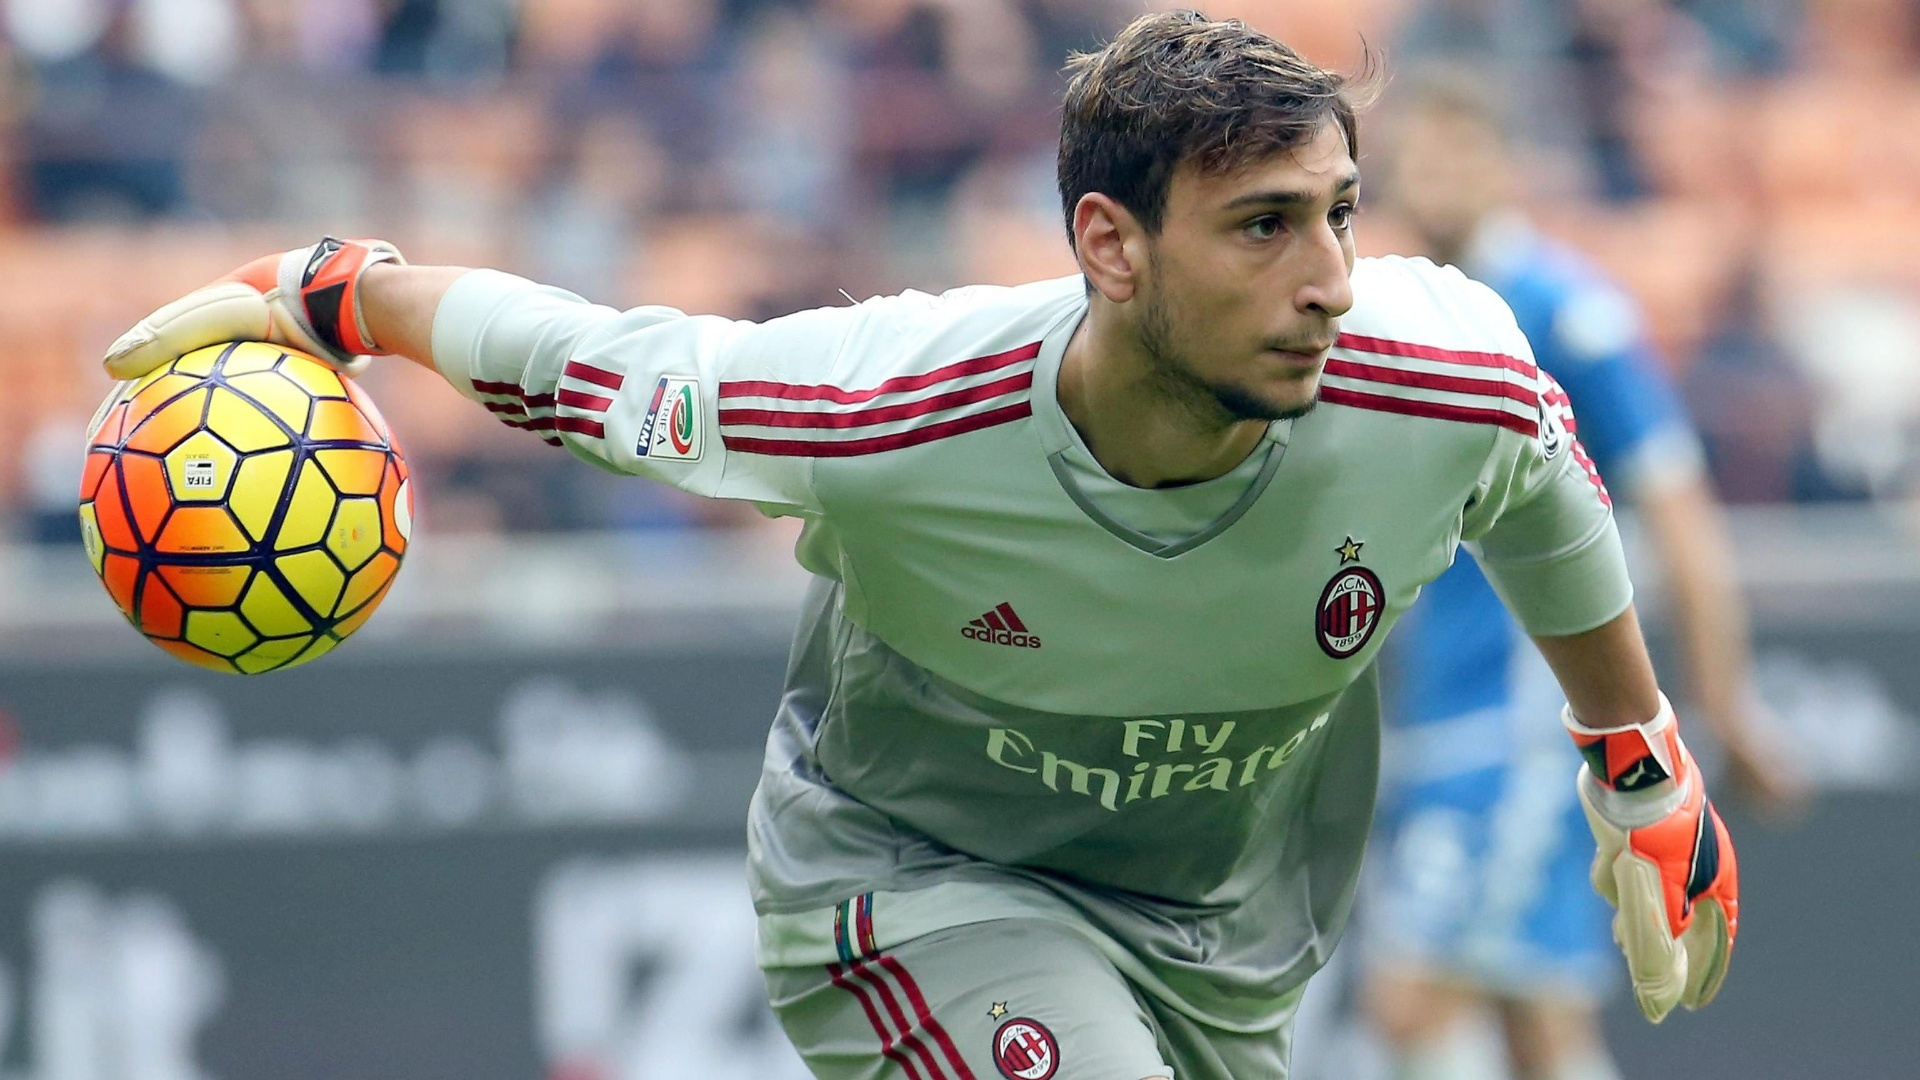 Gianluigi Donnarumma, goleiro do Milan que tem apenas 16 anos